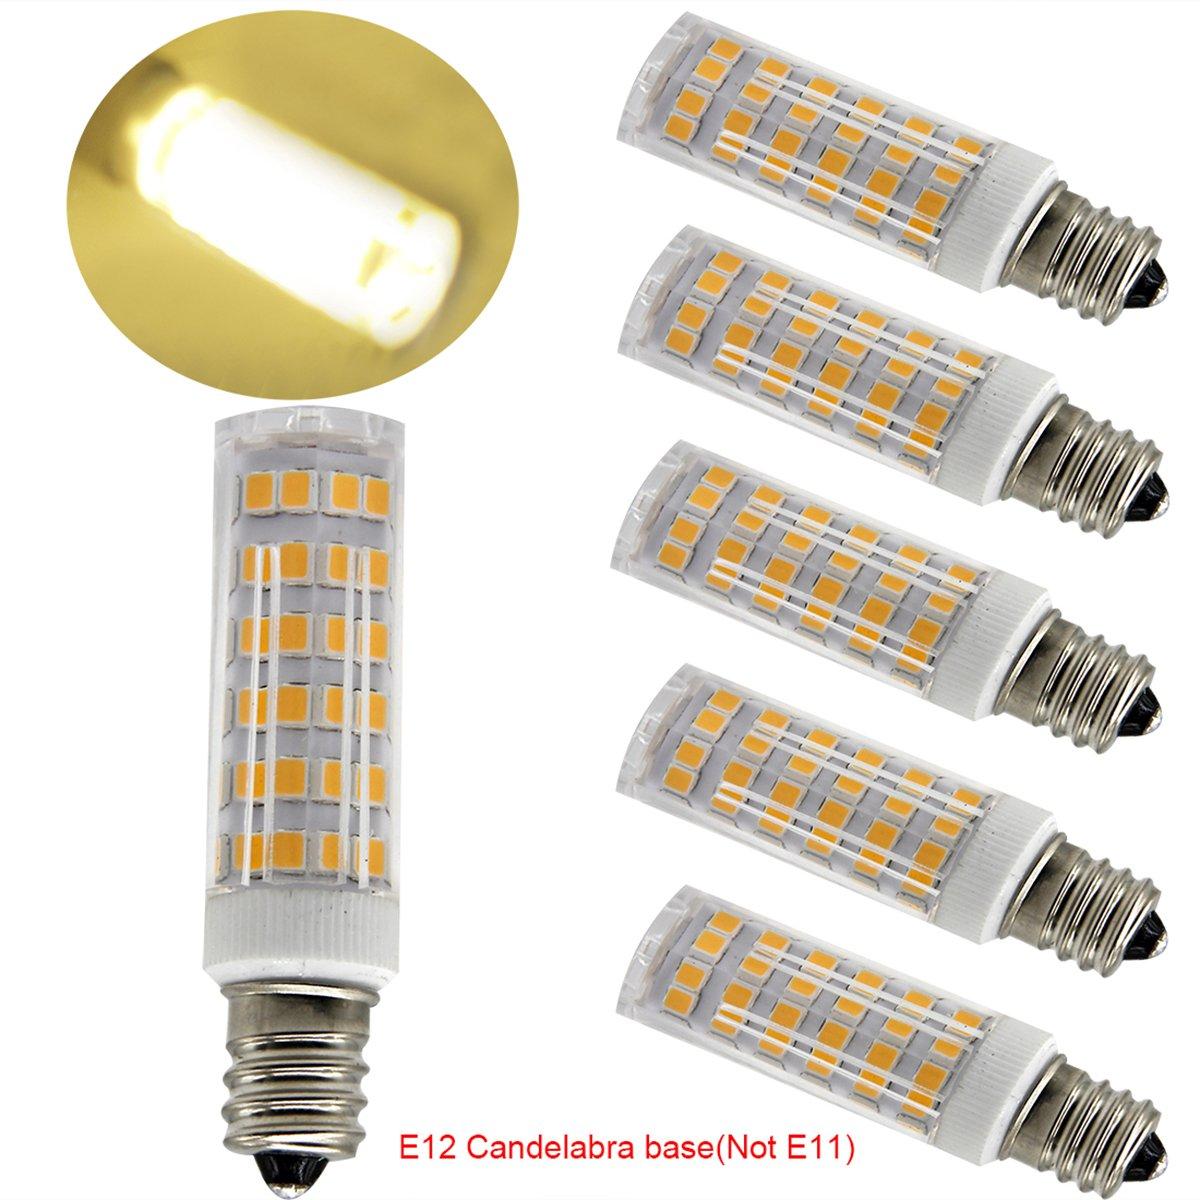 Ulight Led E12 led light bulb 120V, Warm White 6W Led E12 Candelabra Screw base, Xenon JD type led halogen bulb replacement 50W or 60W ceiling fan light bulbs with 550lm-5packs (Warm White 3000K)